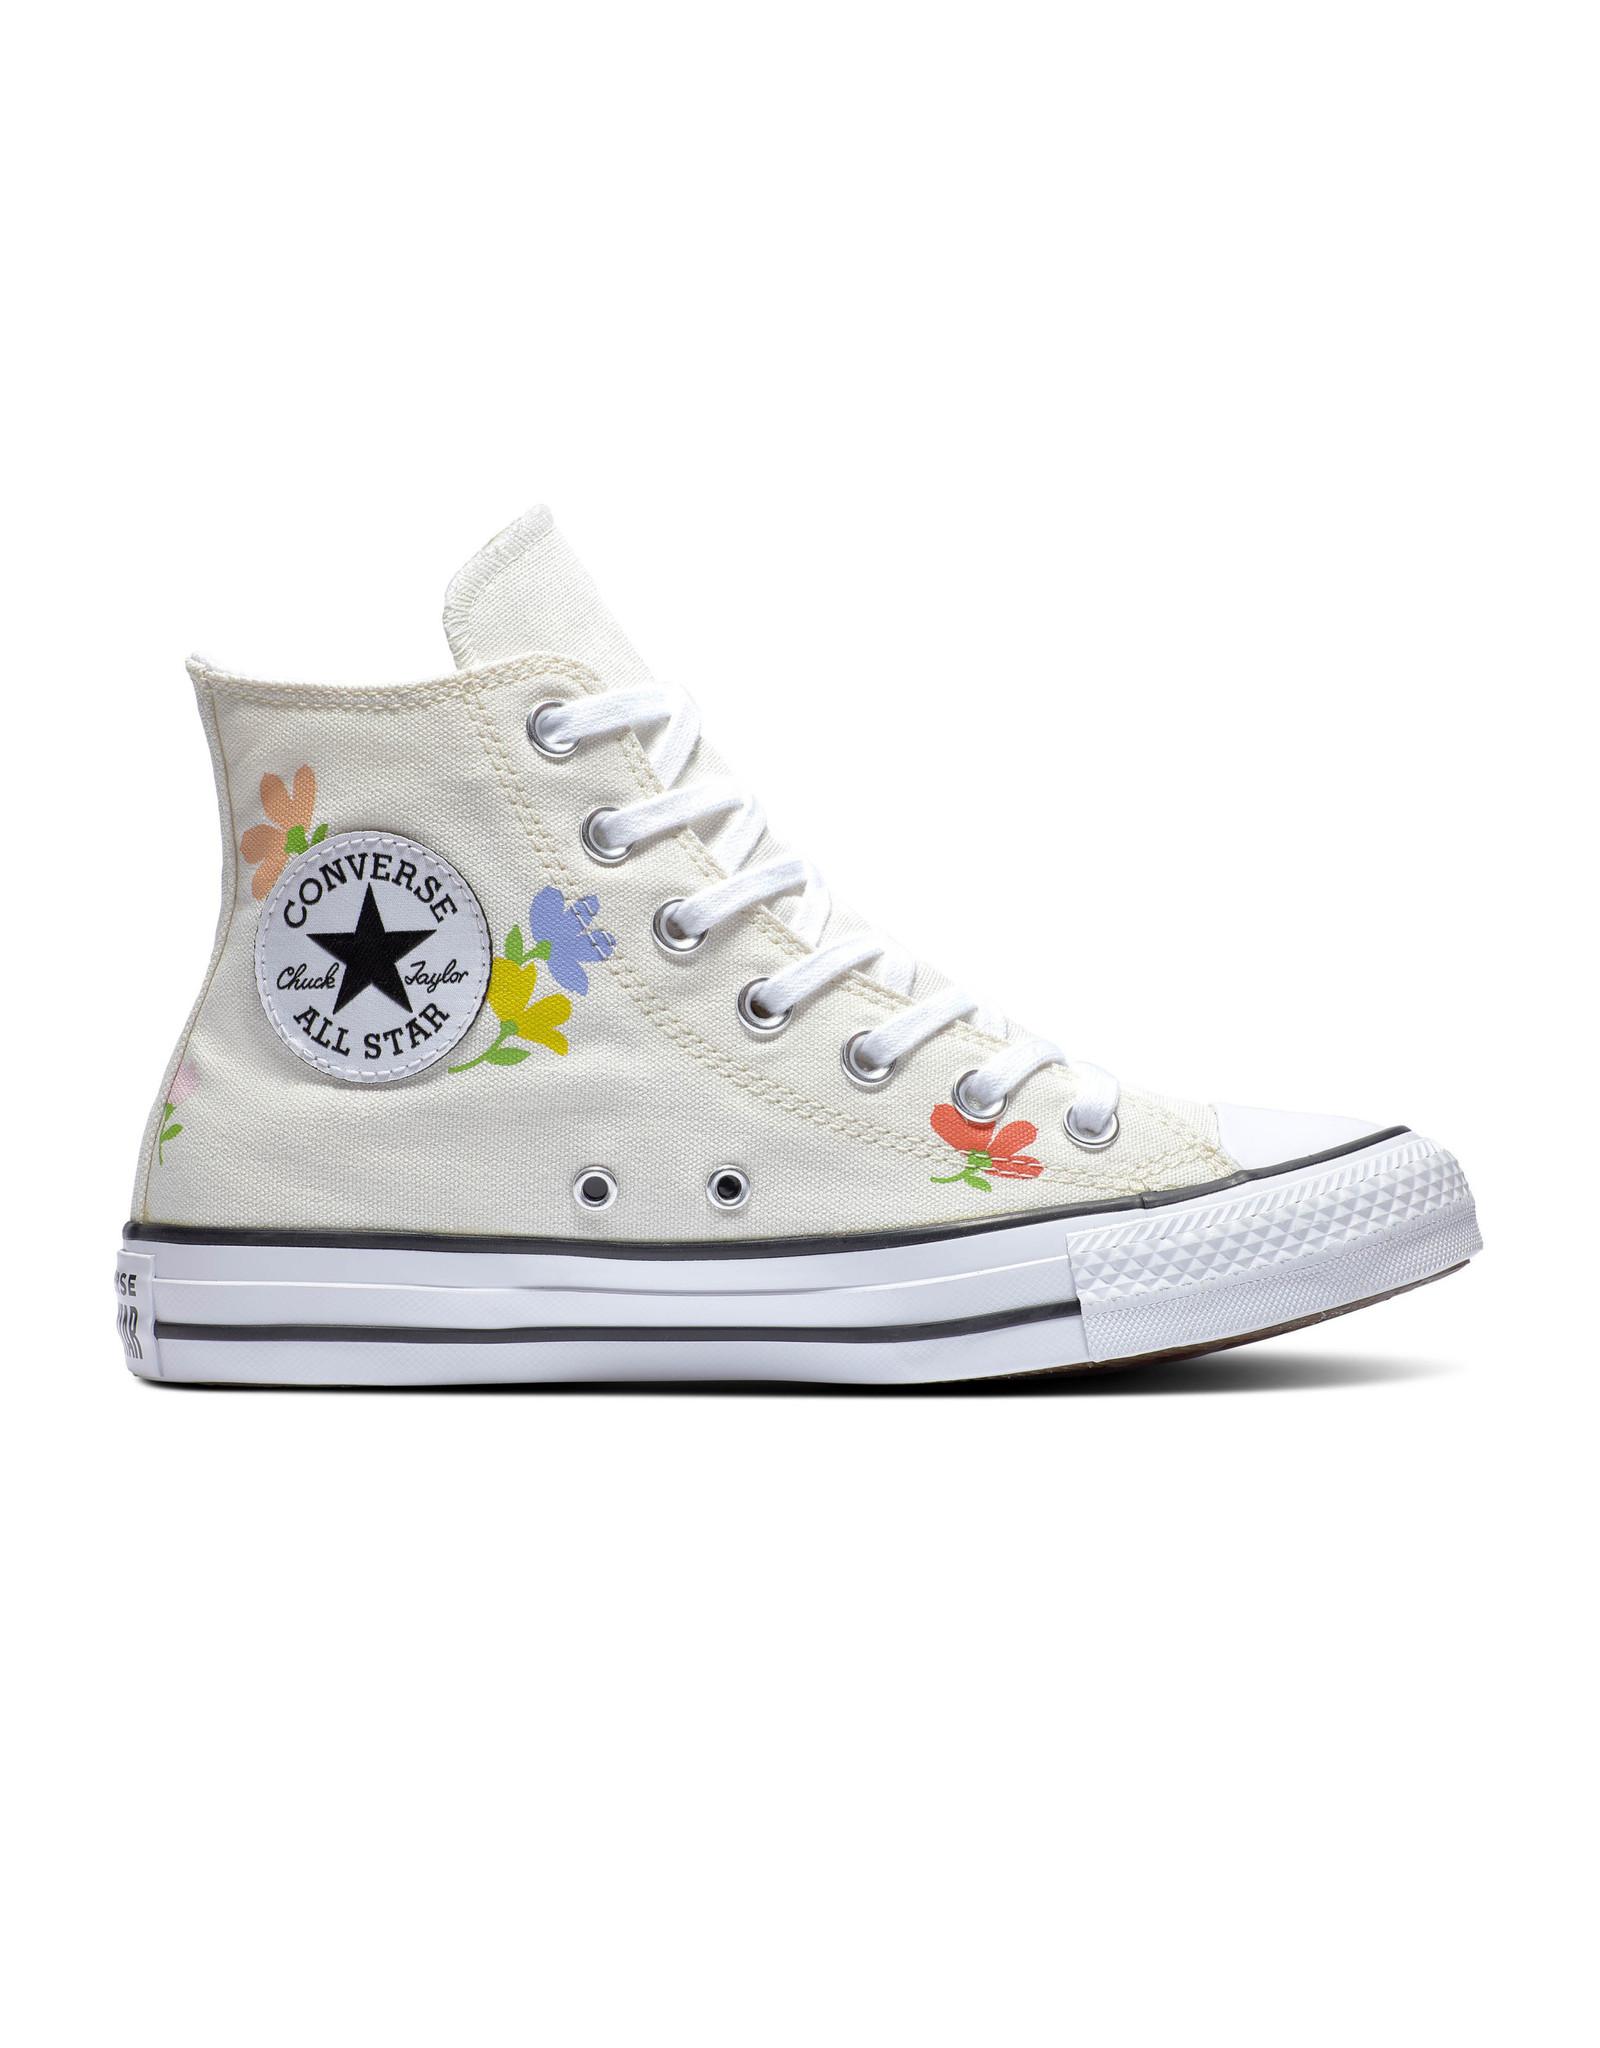 CONVERSE CHUCK TAYLOR ALL STAR HI EGRET/BLACK/WHITE C21FLOW-570919C